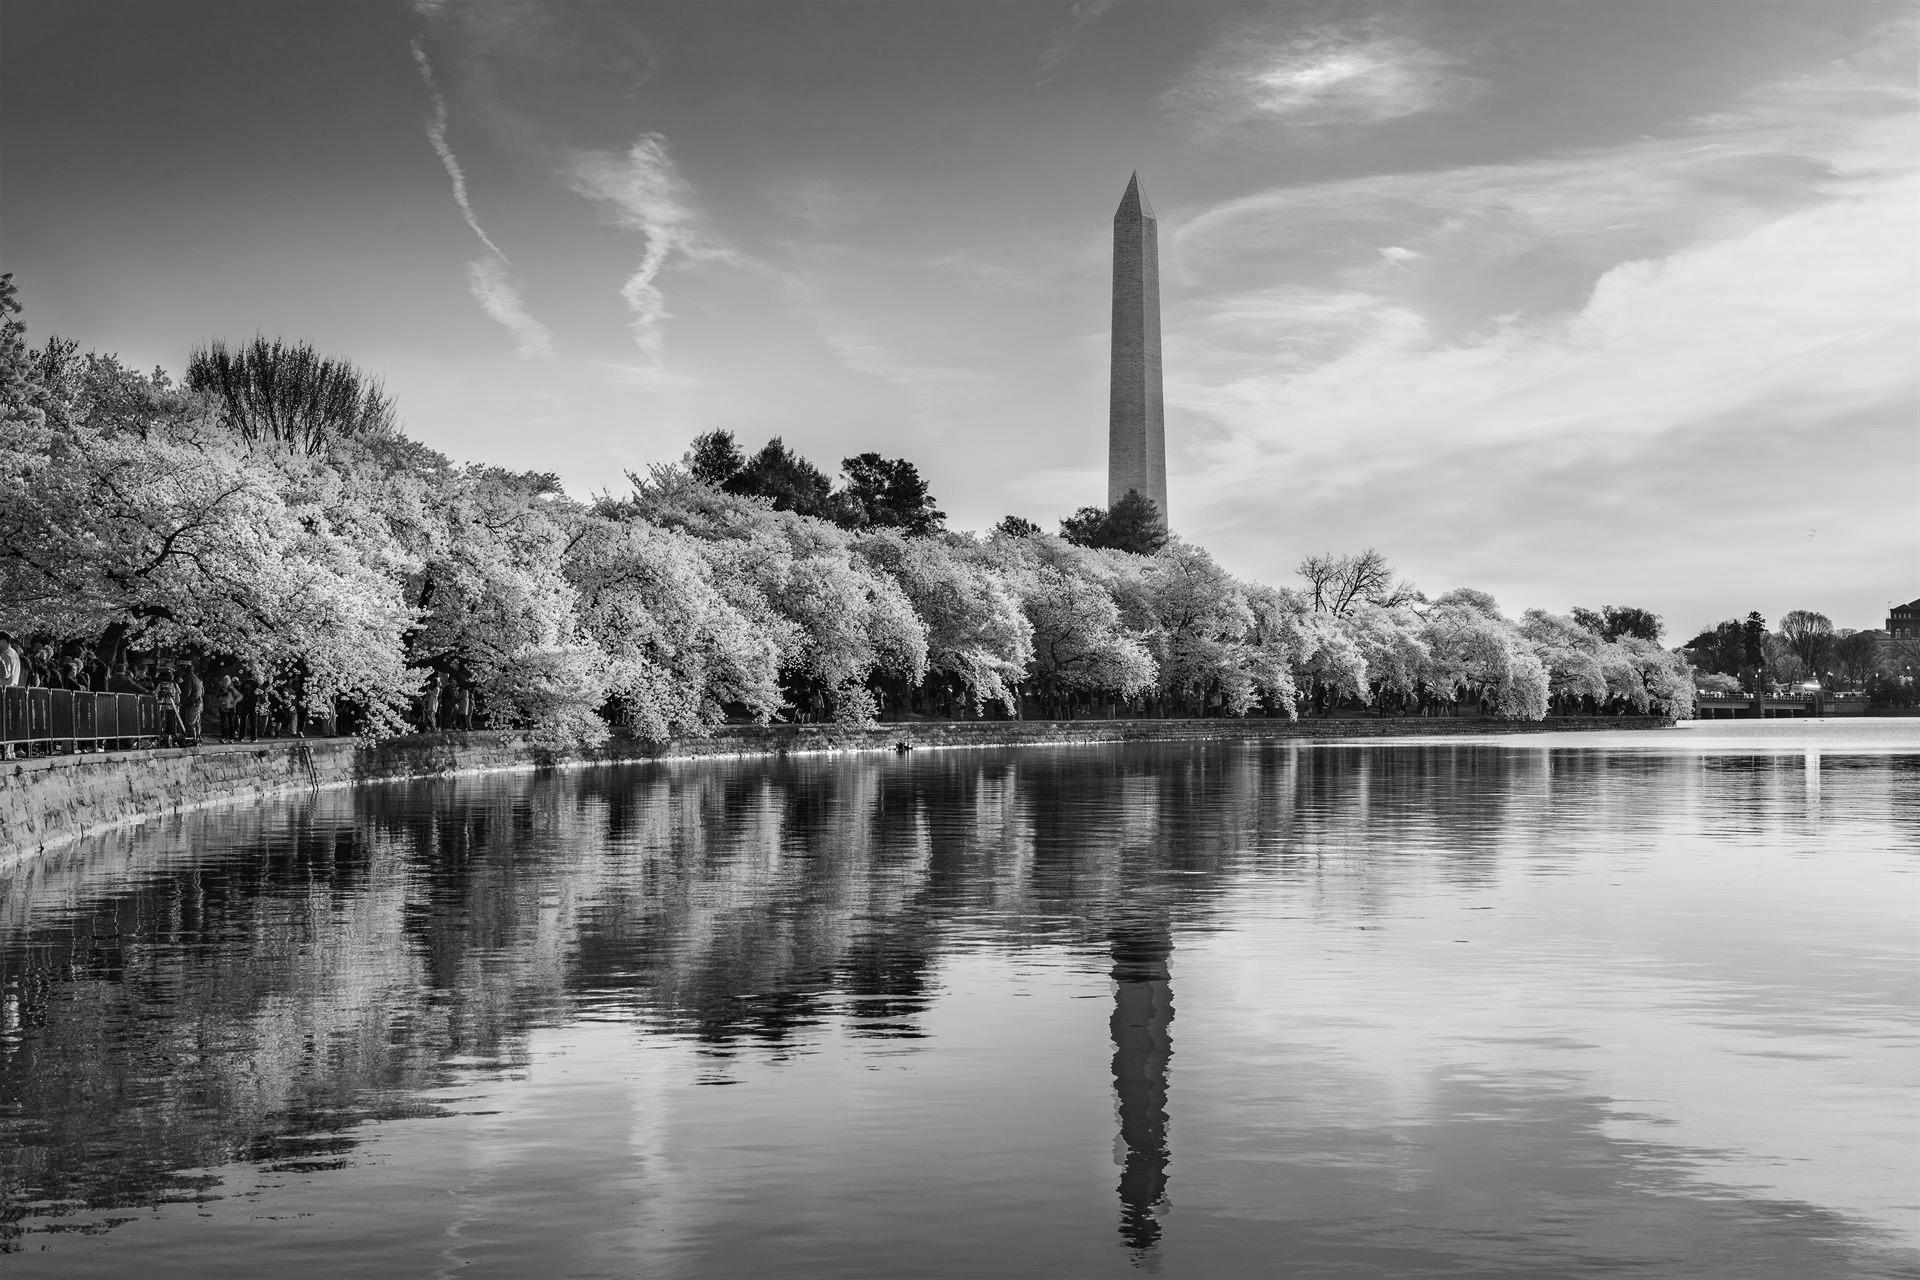 Black and White photo of Washington DC, USA at the tidal basin with Washington Monument in spring season.